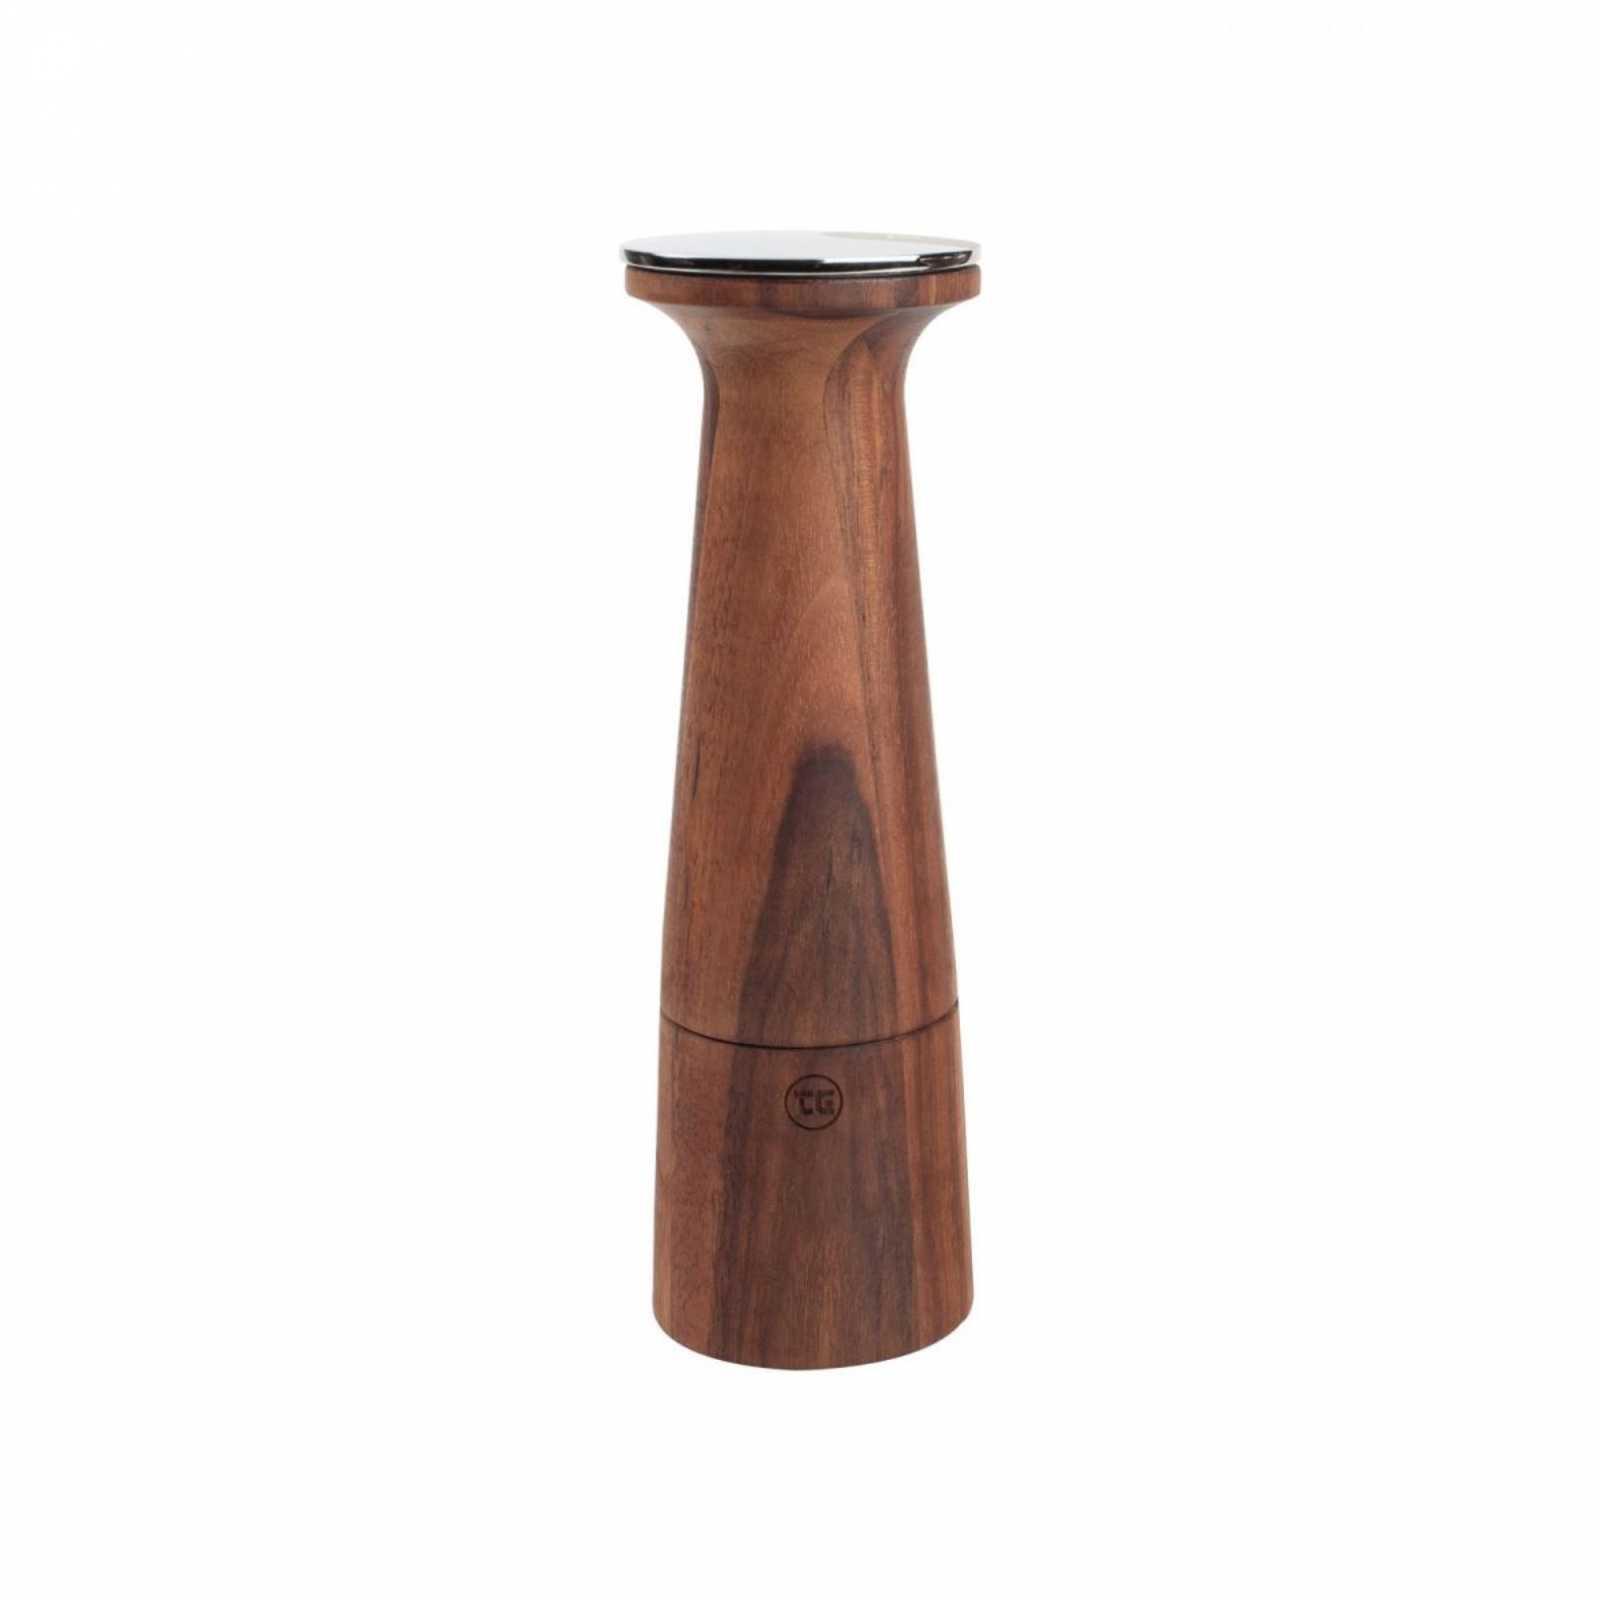 Онлайн каталог PROMENU: Мельница для перца T&G OBLIQUE, высота 20,5 см, темно-бежевый с темным рисунком T&G 11654